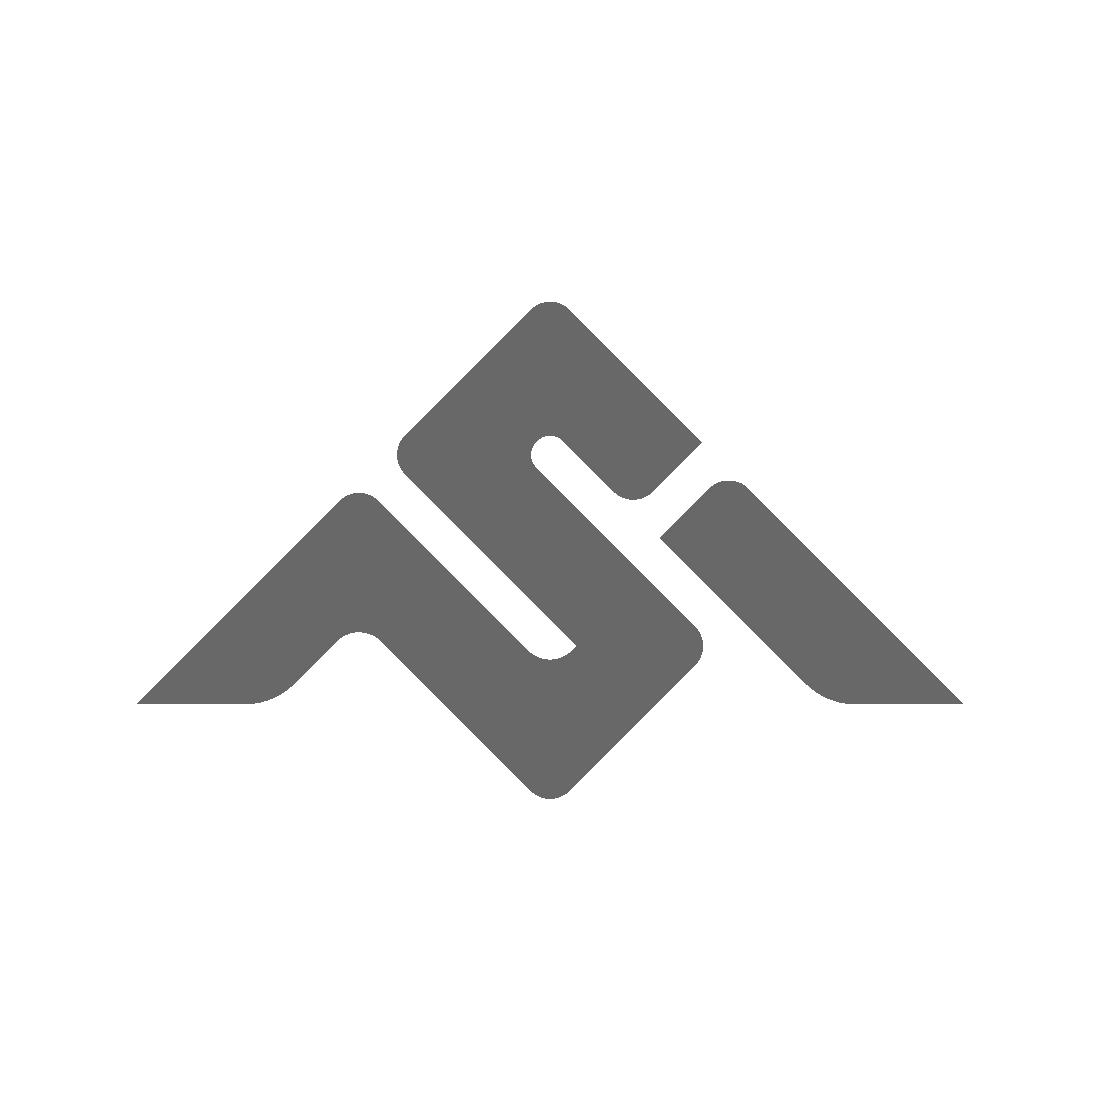 8 Fond De Skate Magasin Salomon Set Complet Equipe Achat Ski Shop xFtpP